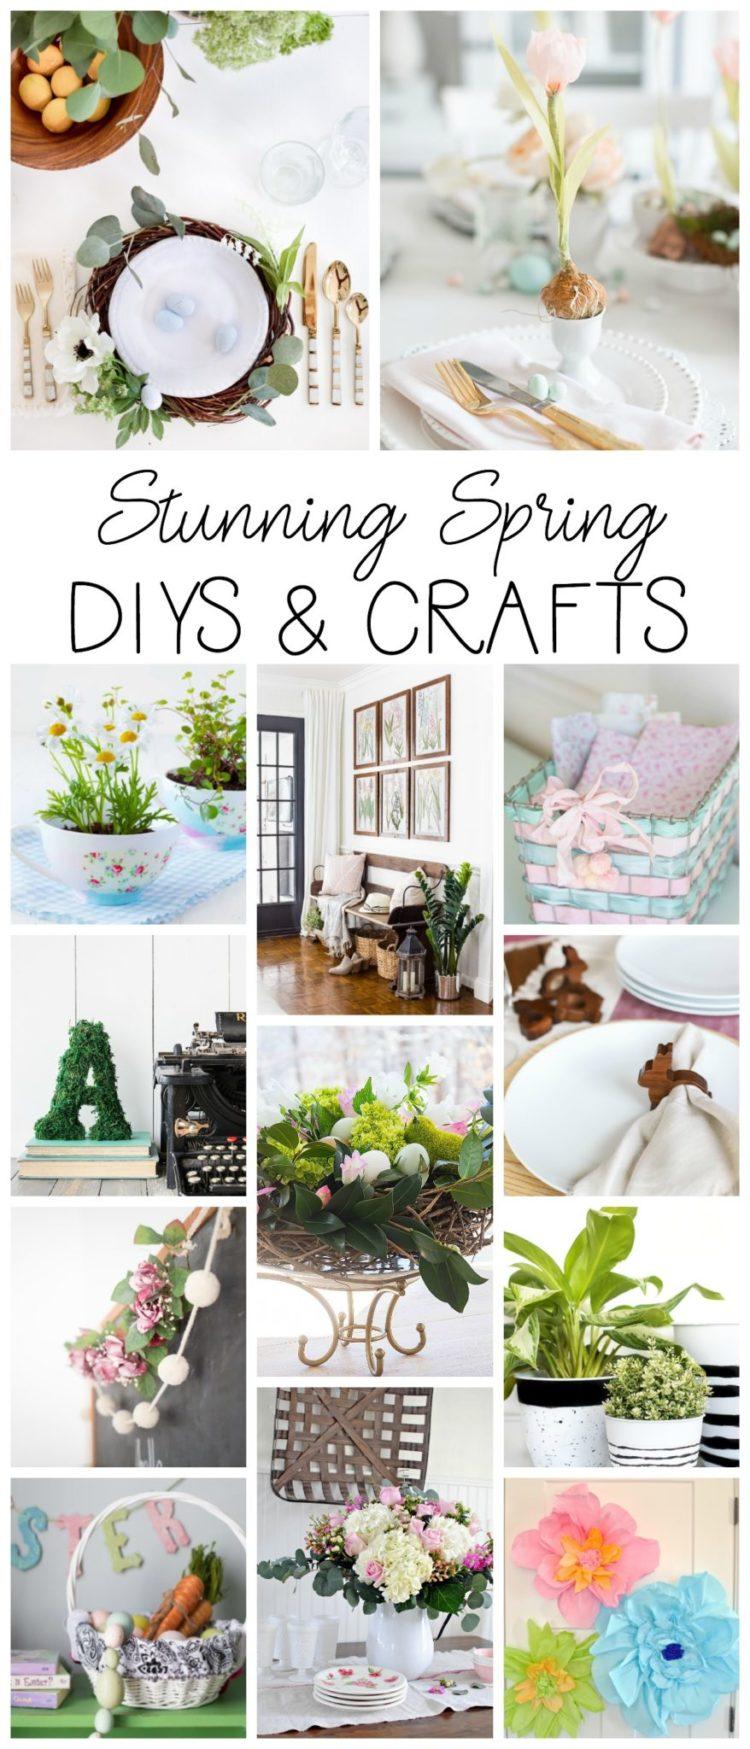 Stunning Spring DIYS & Crafts poster.